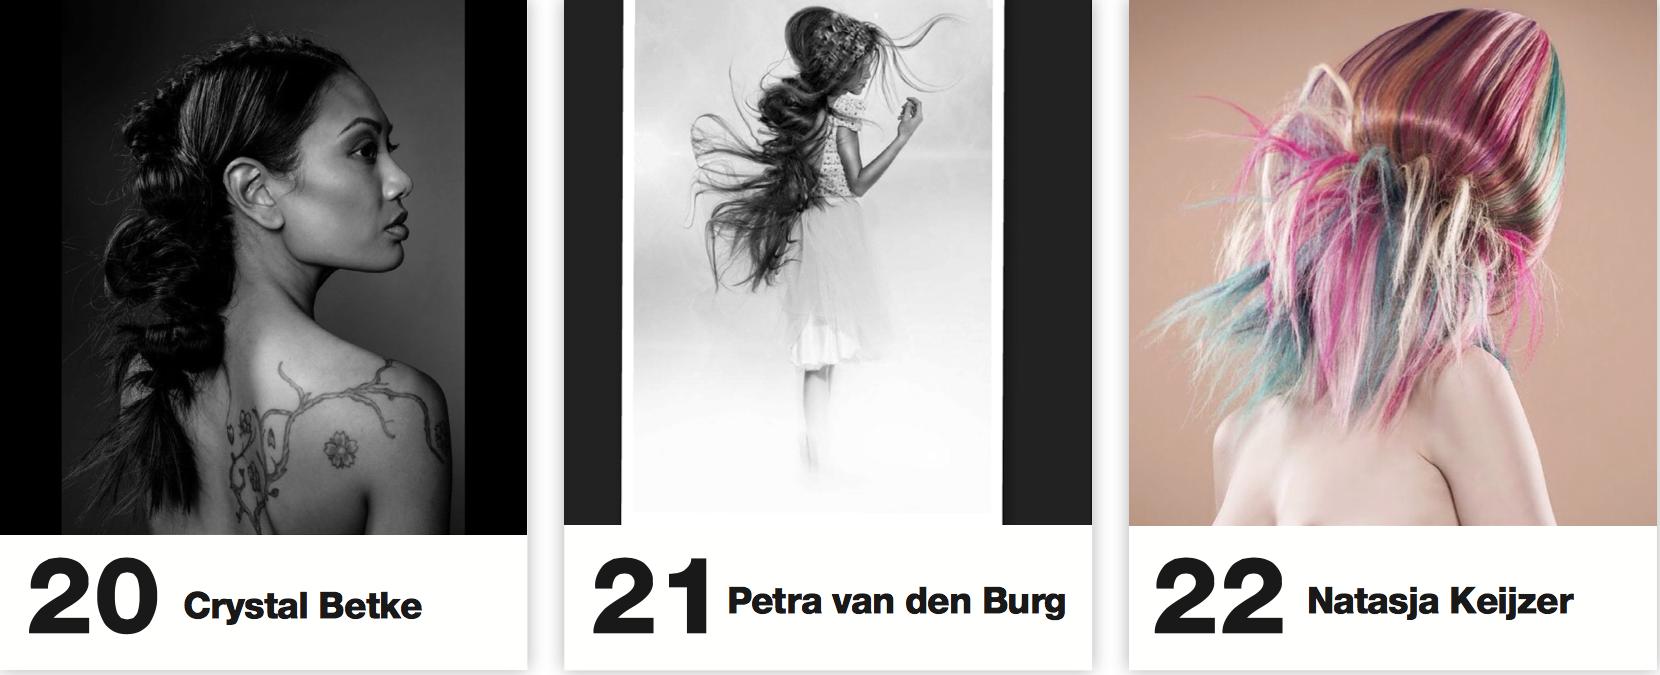 NL Hairartists wereldwijd 'in the picture'